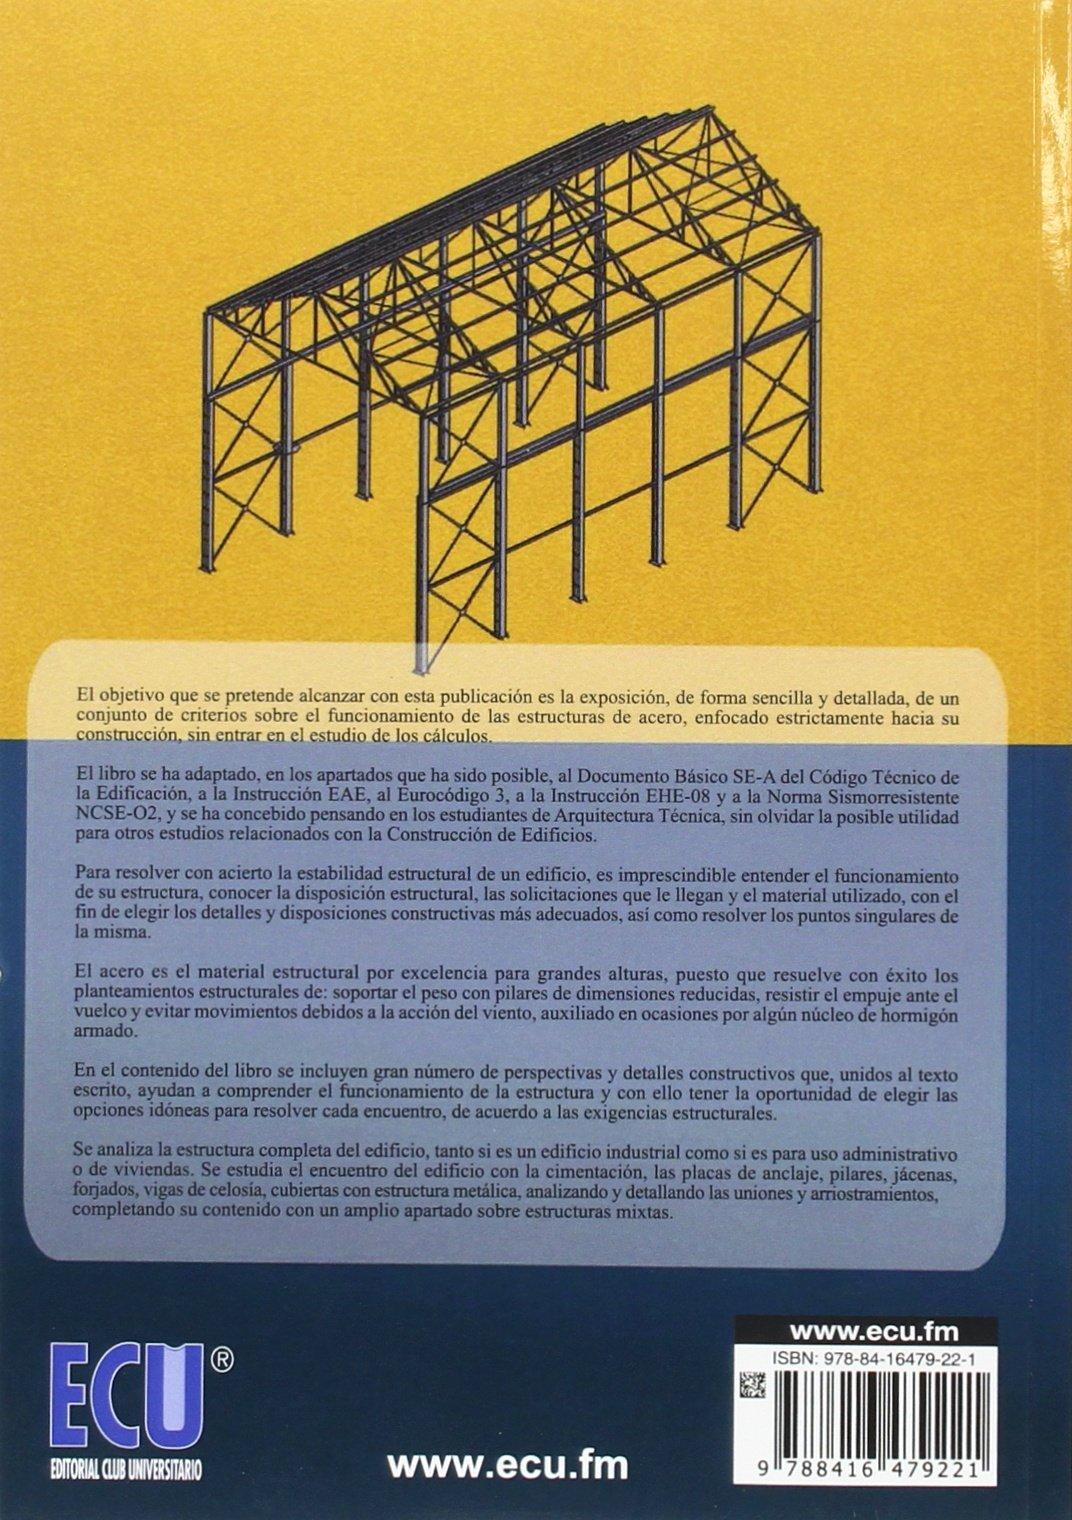 Construcción de estructuras metálicas 5ª ed.: Amazon.es: Pascual Urbán Brotóns: Libros